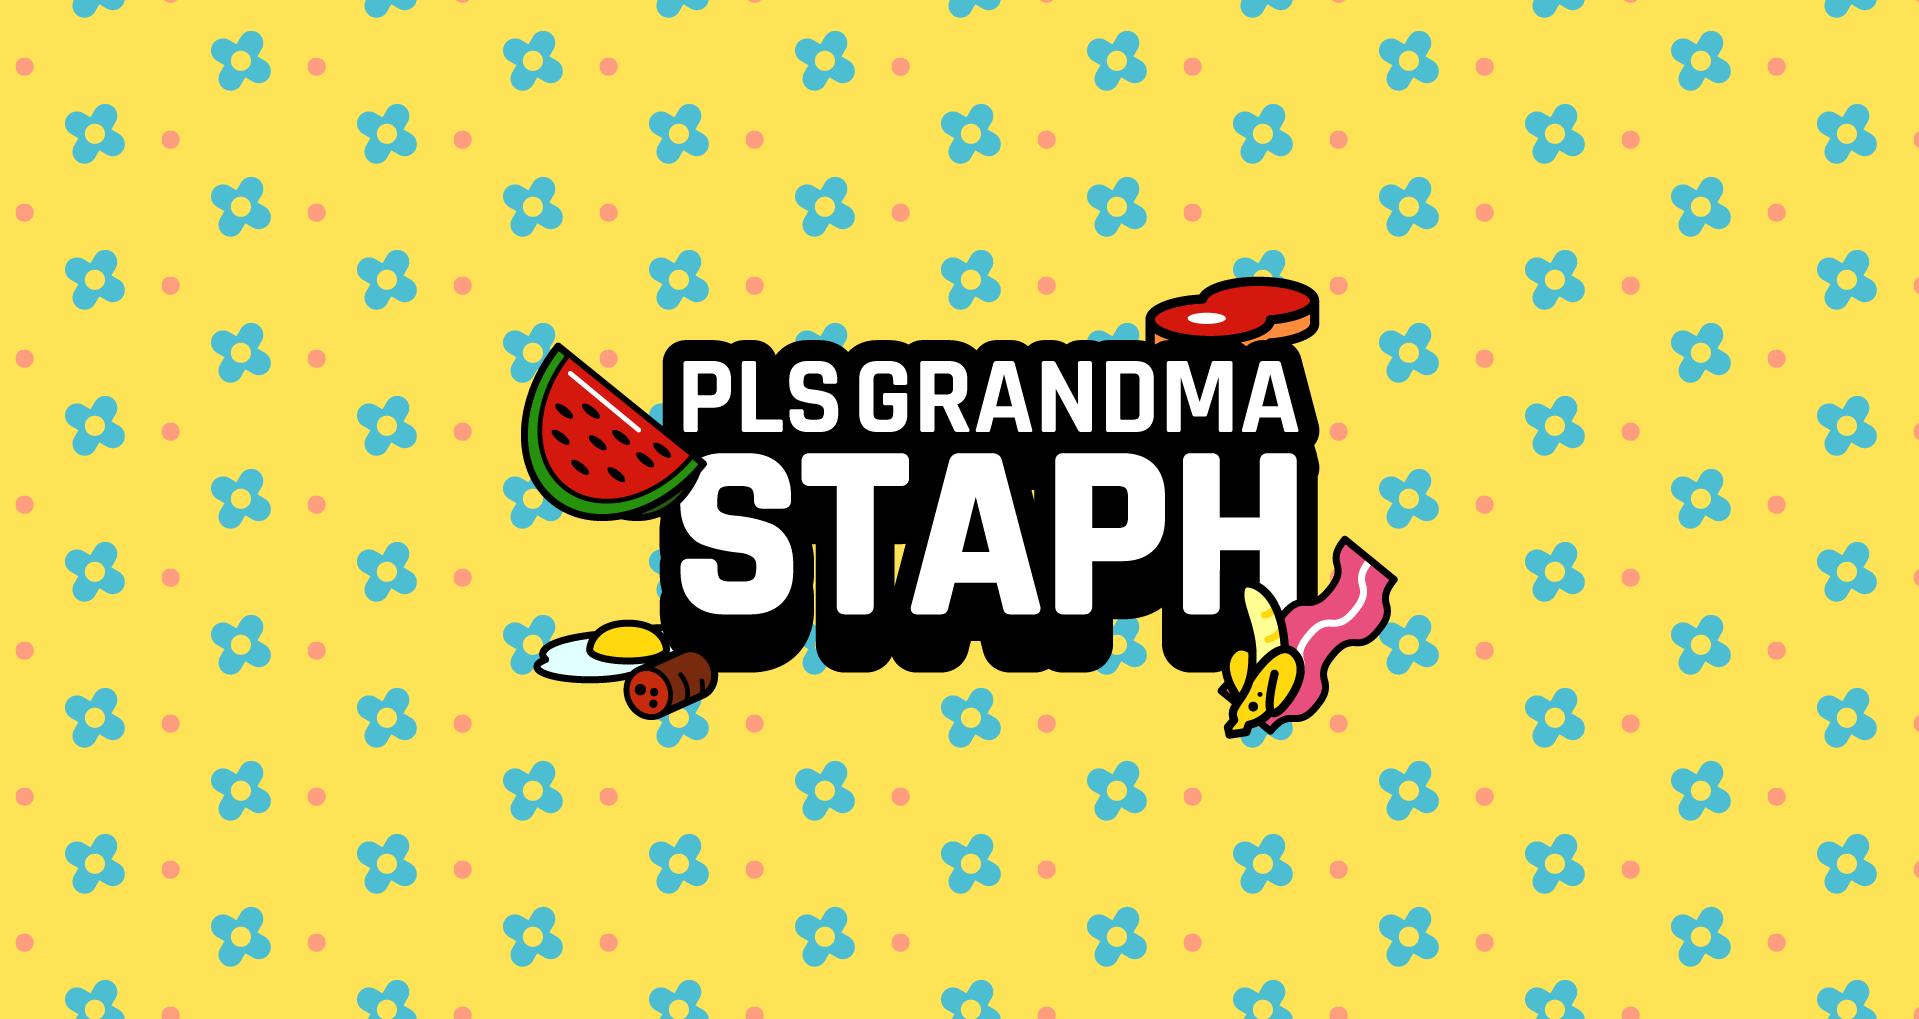 Pls Grandma STAPH